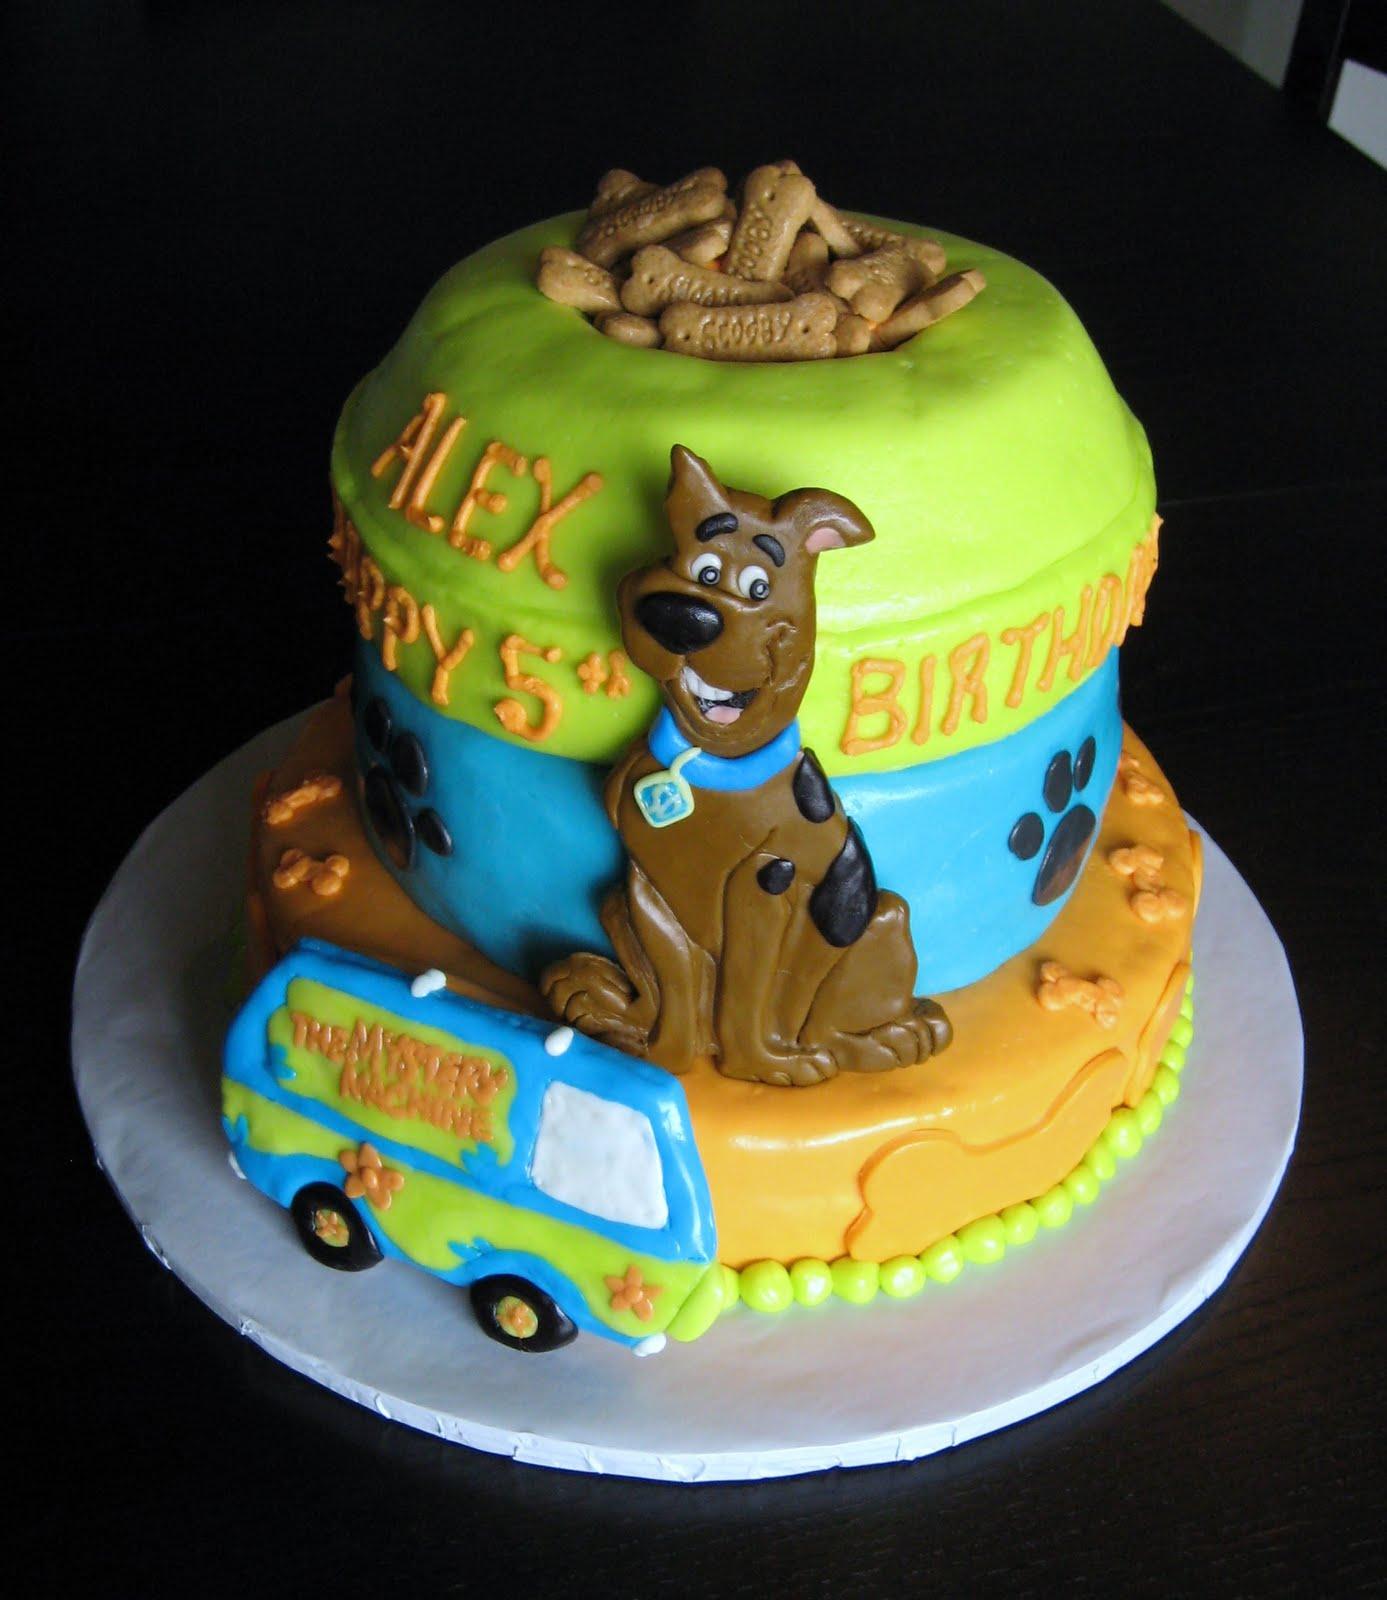 Edible Scooby Doo Cake Decorations